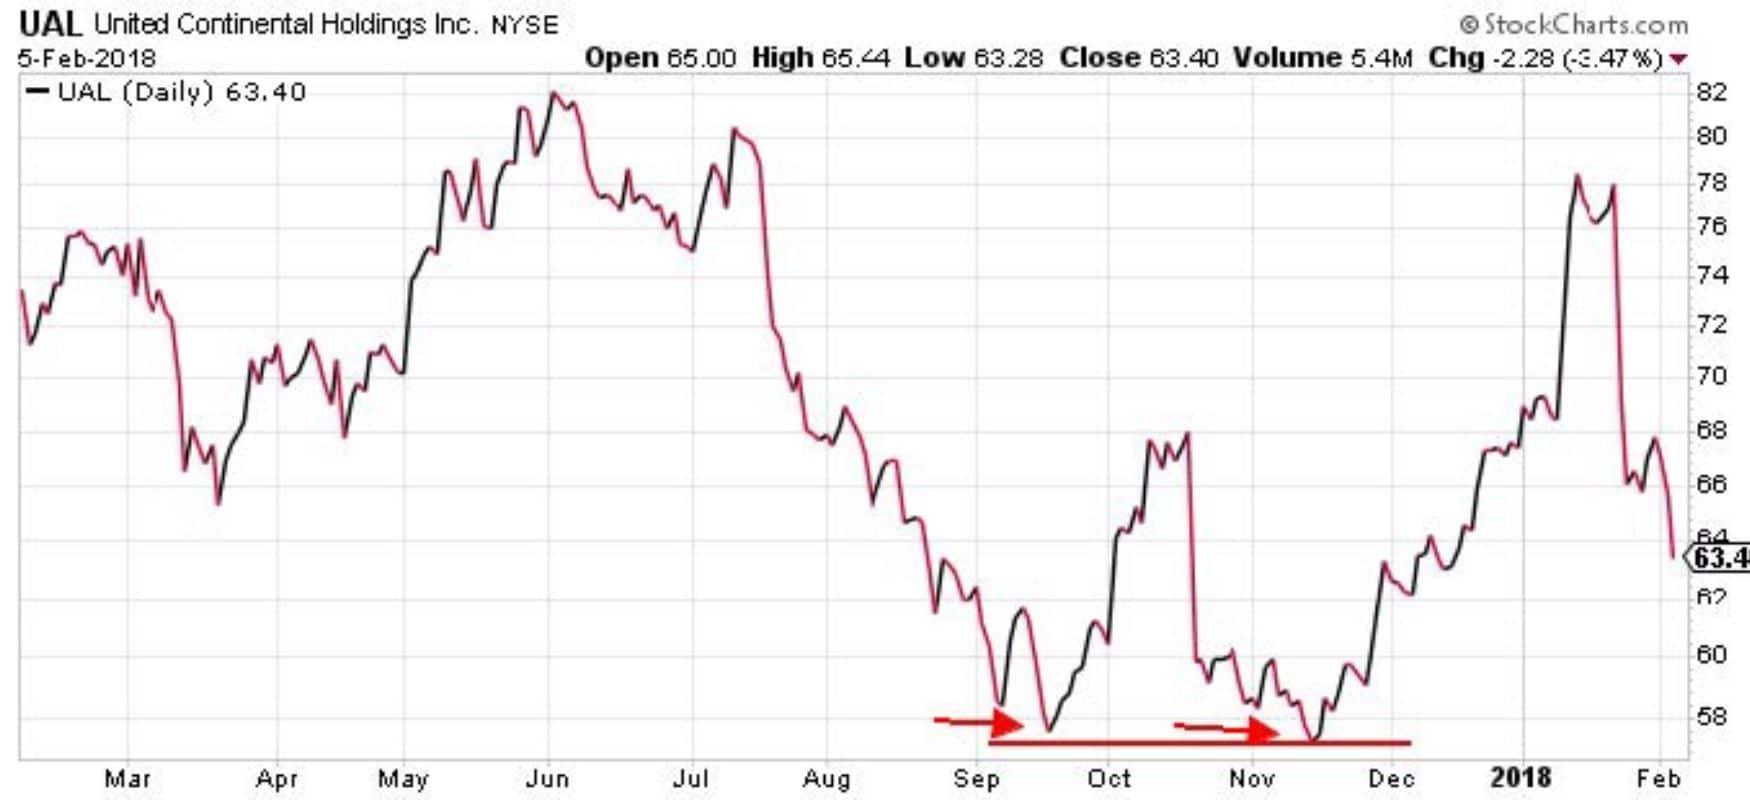 outil trading graphique bas